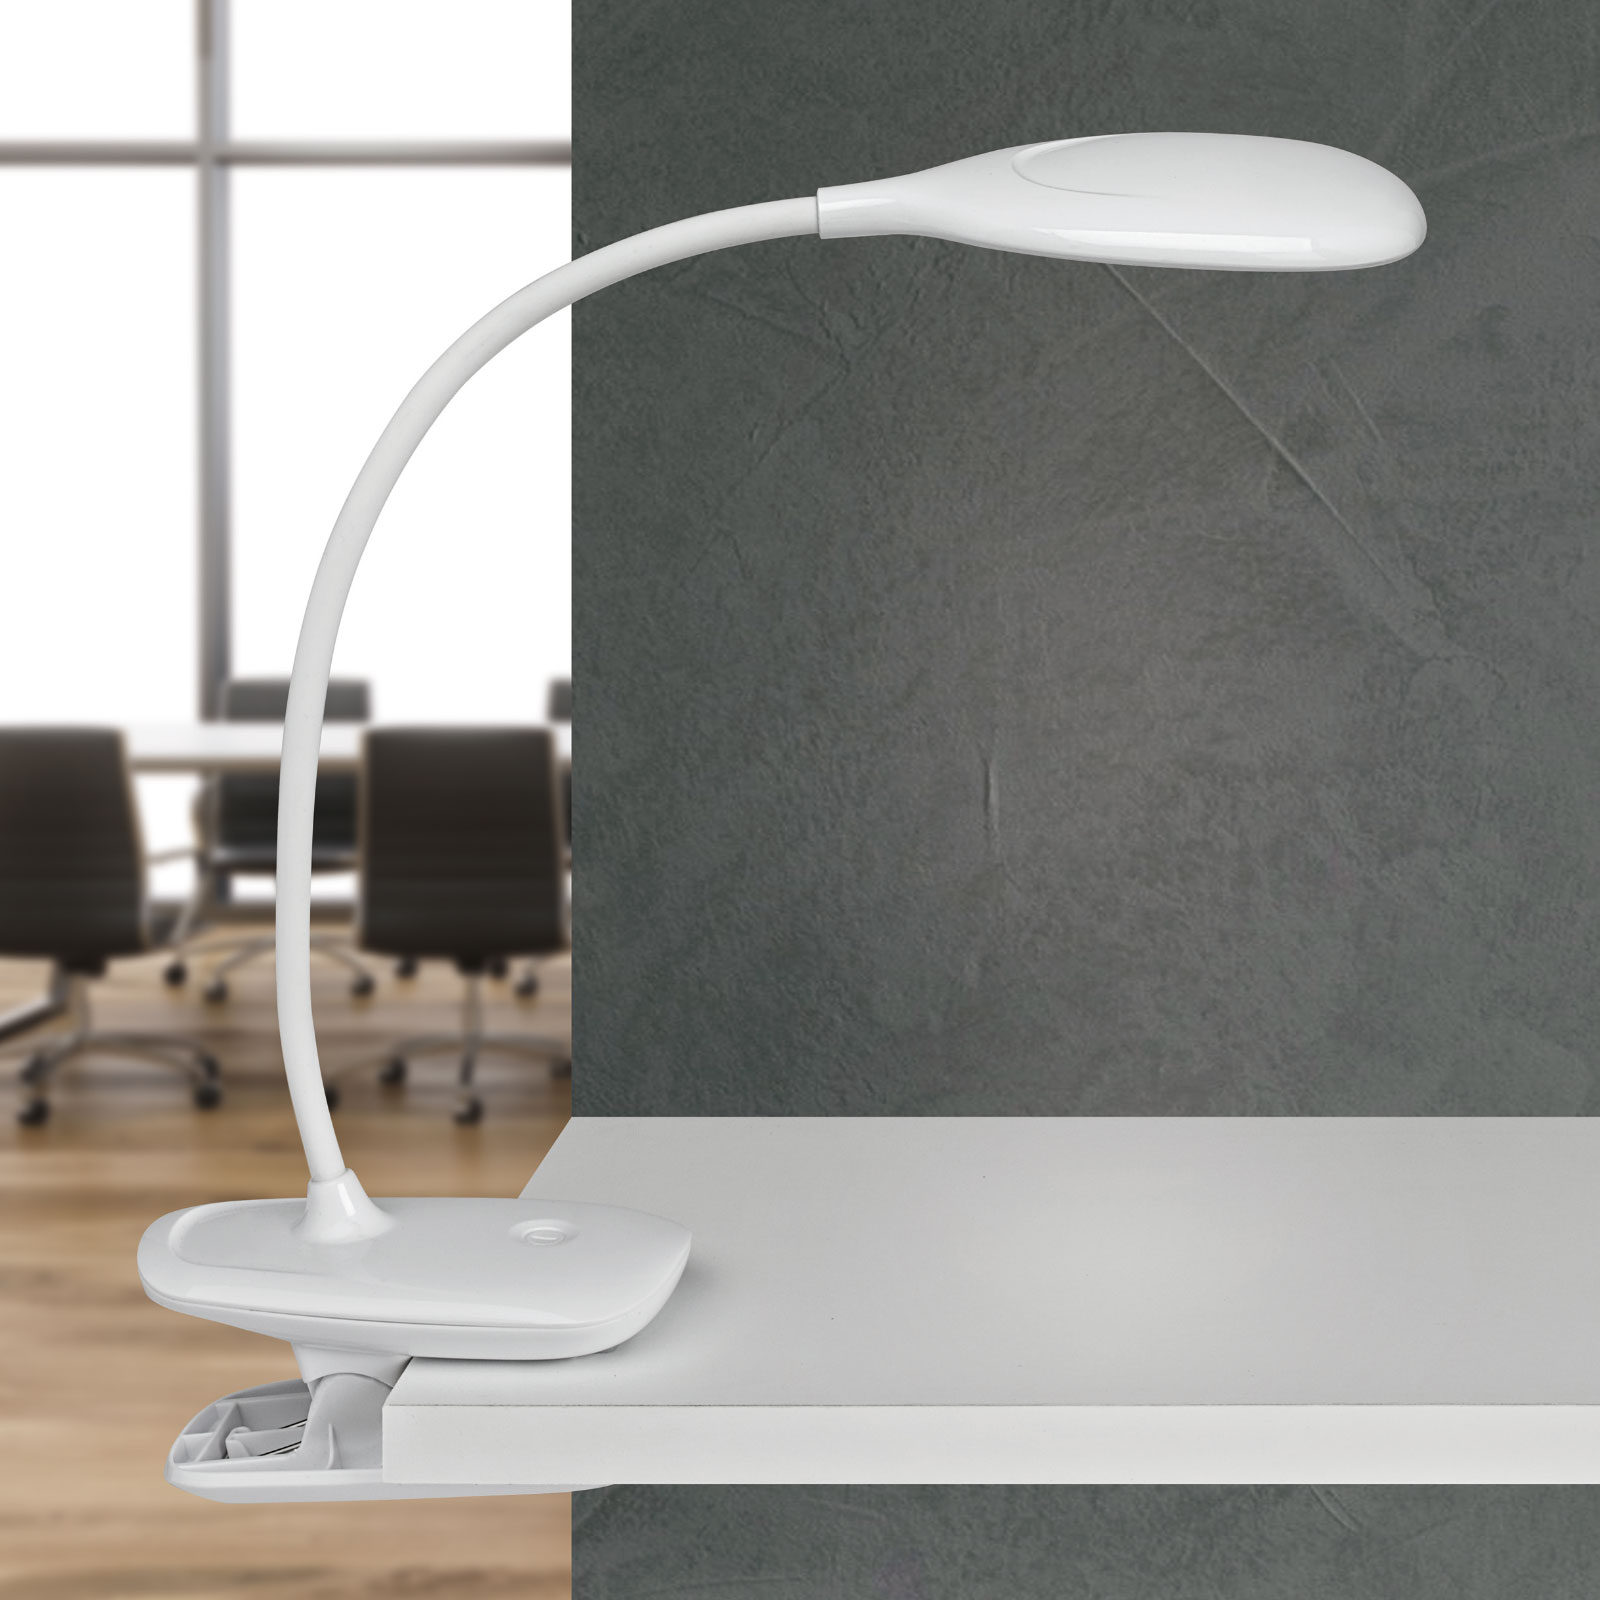 LED-Schreibtischleuchte MAULjack Akku, dimmbar